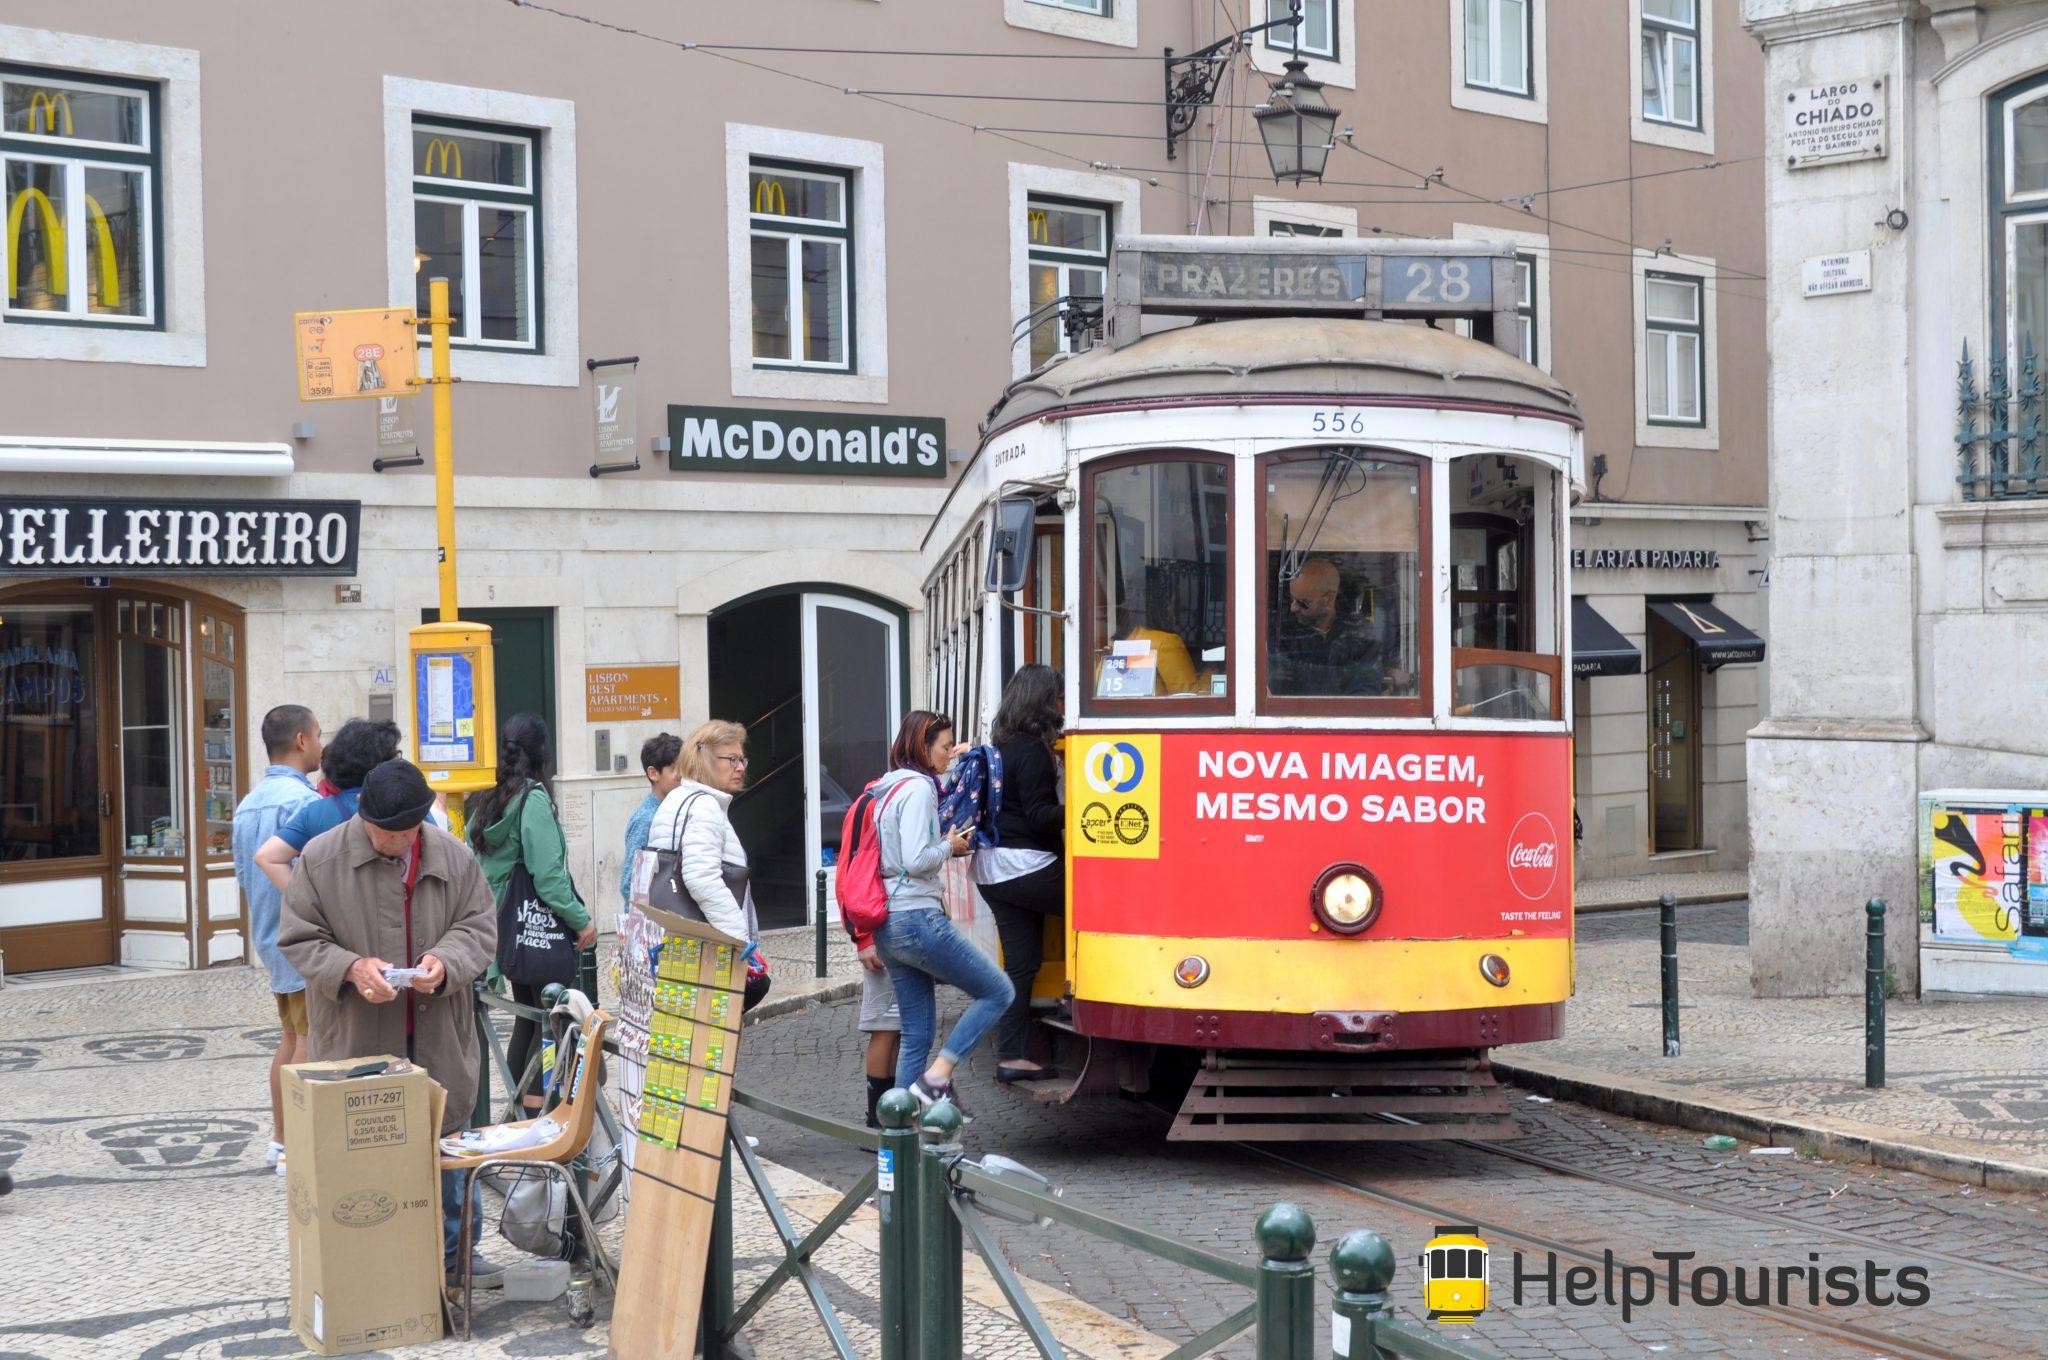 Lissabon Tram 28 Straße